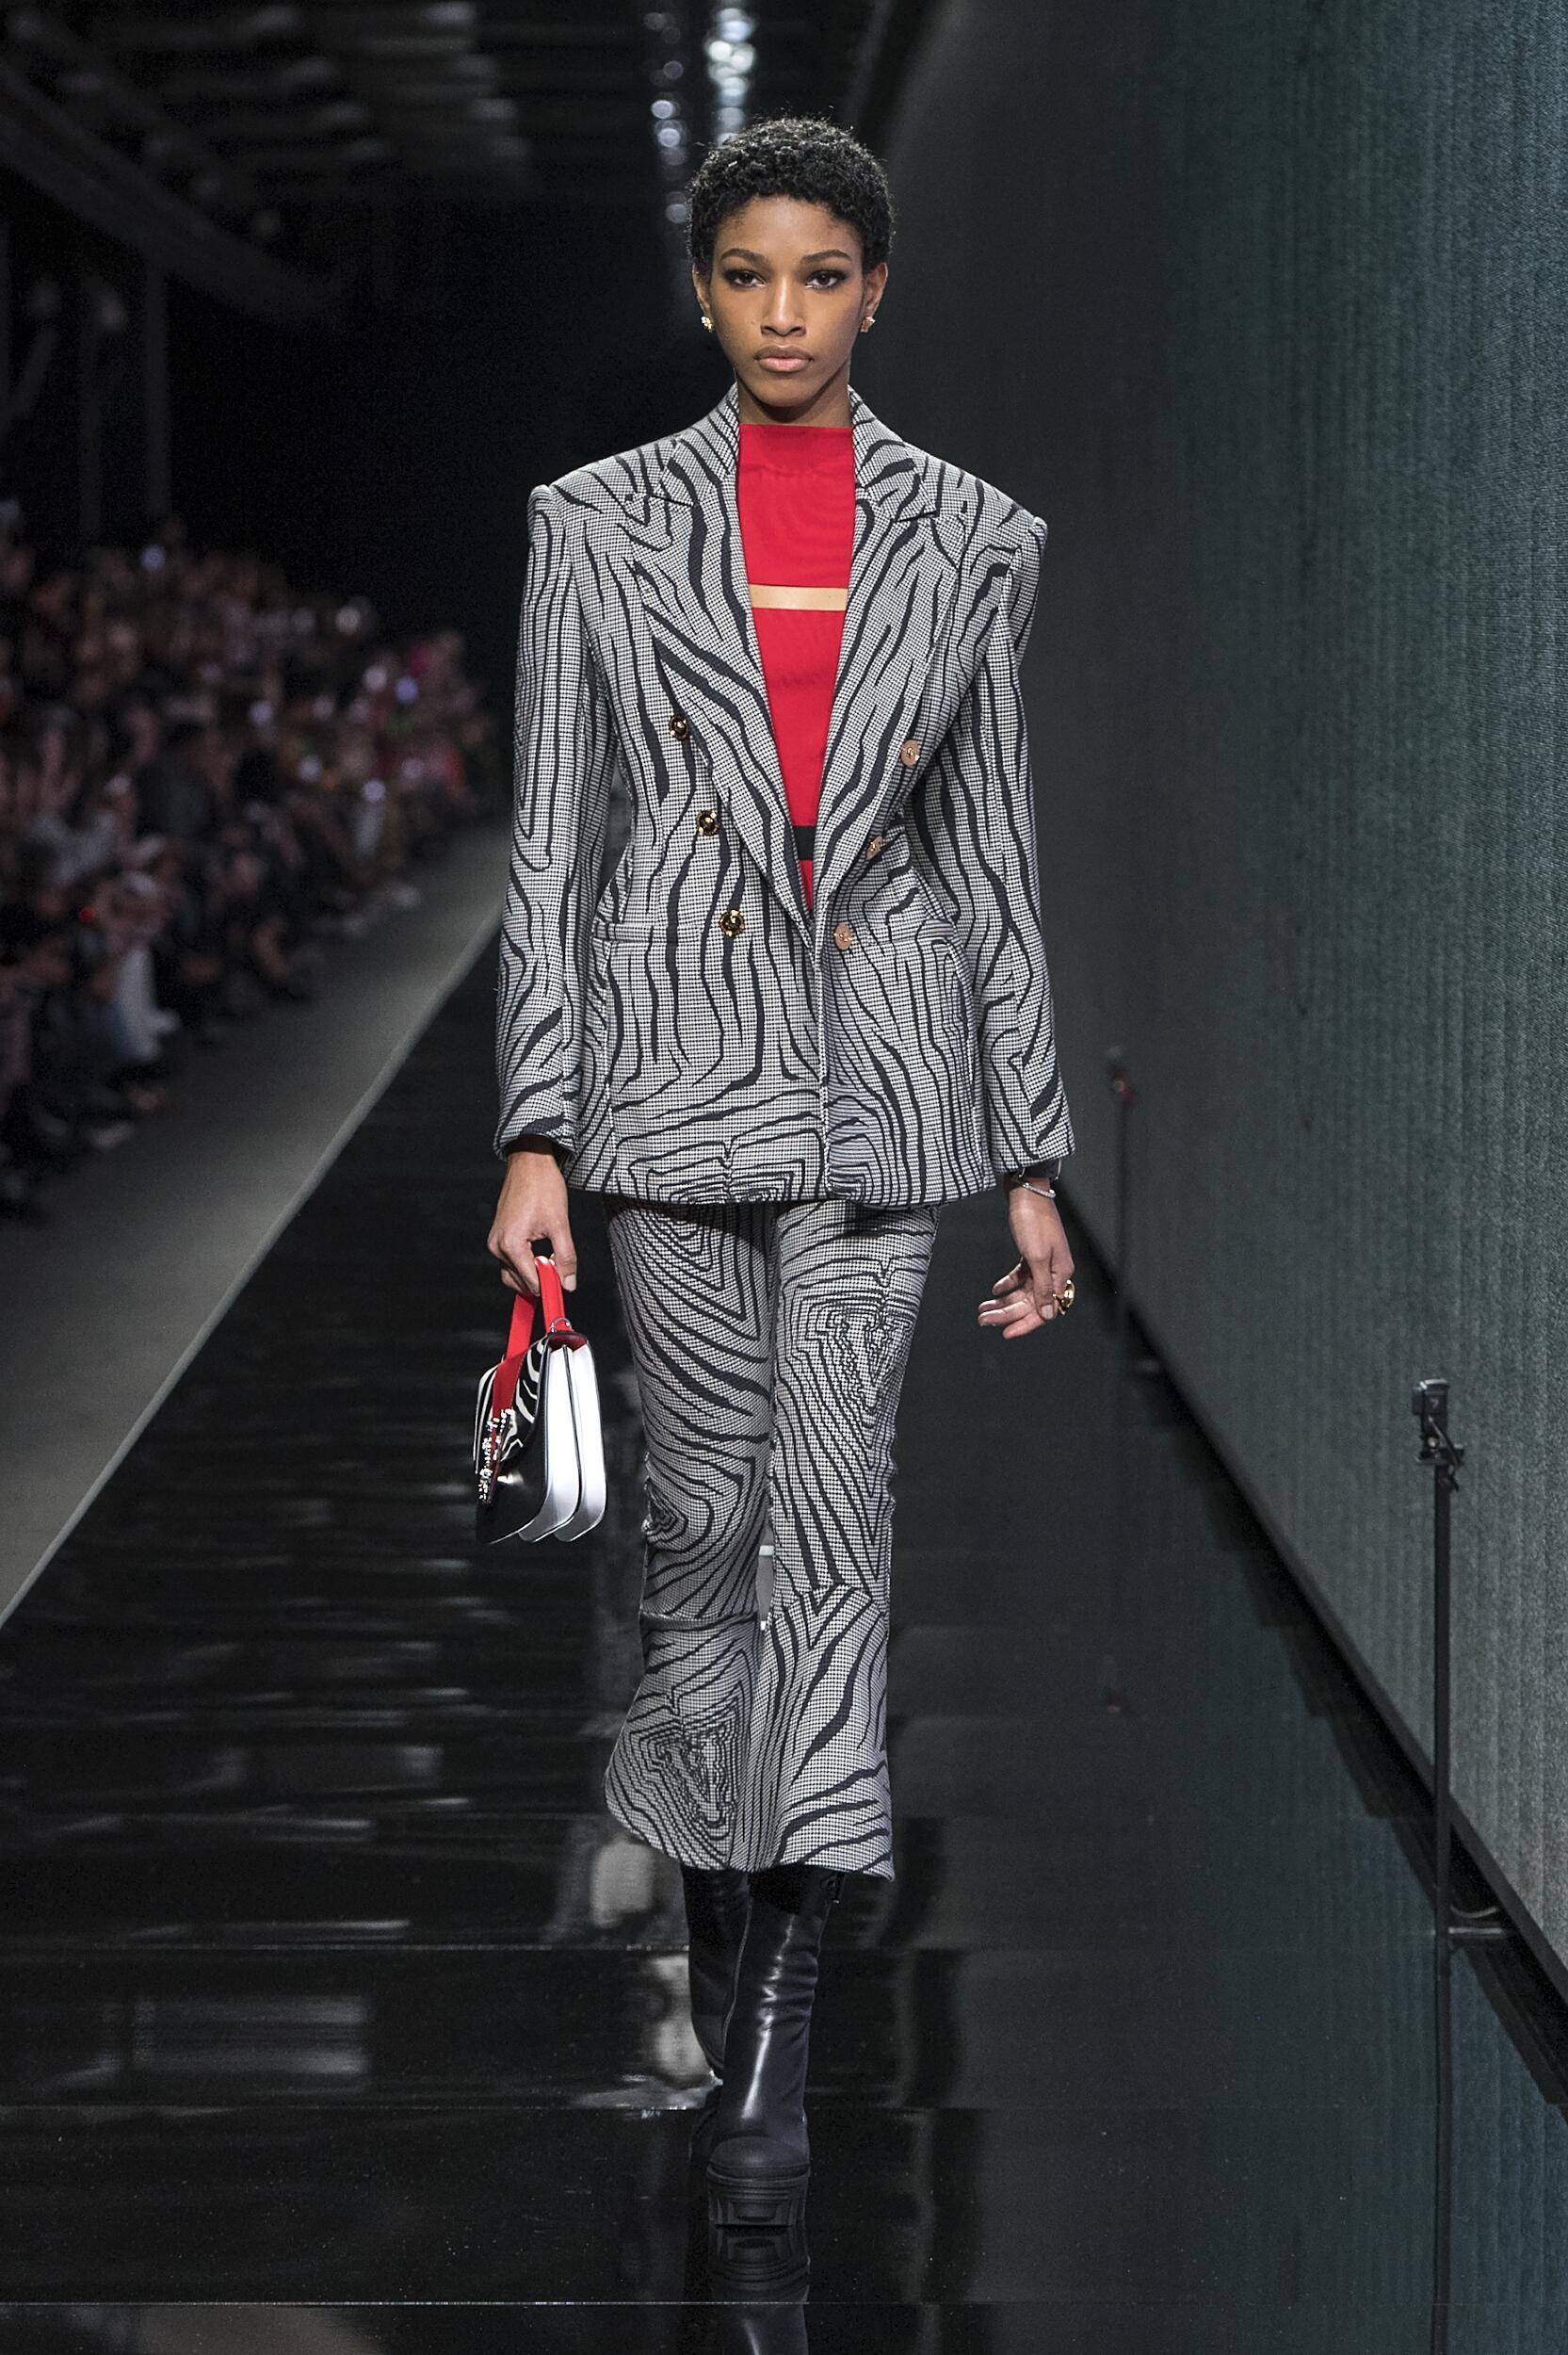 Catwalk Versace Woman Fashion Show Winter 2020